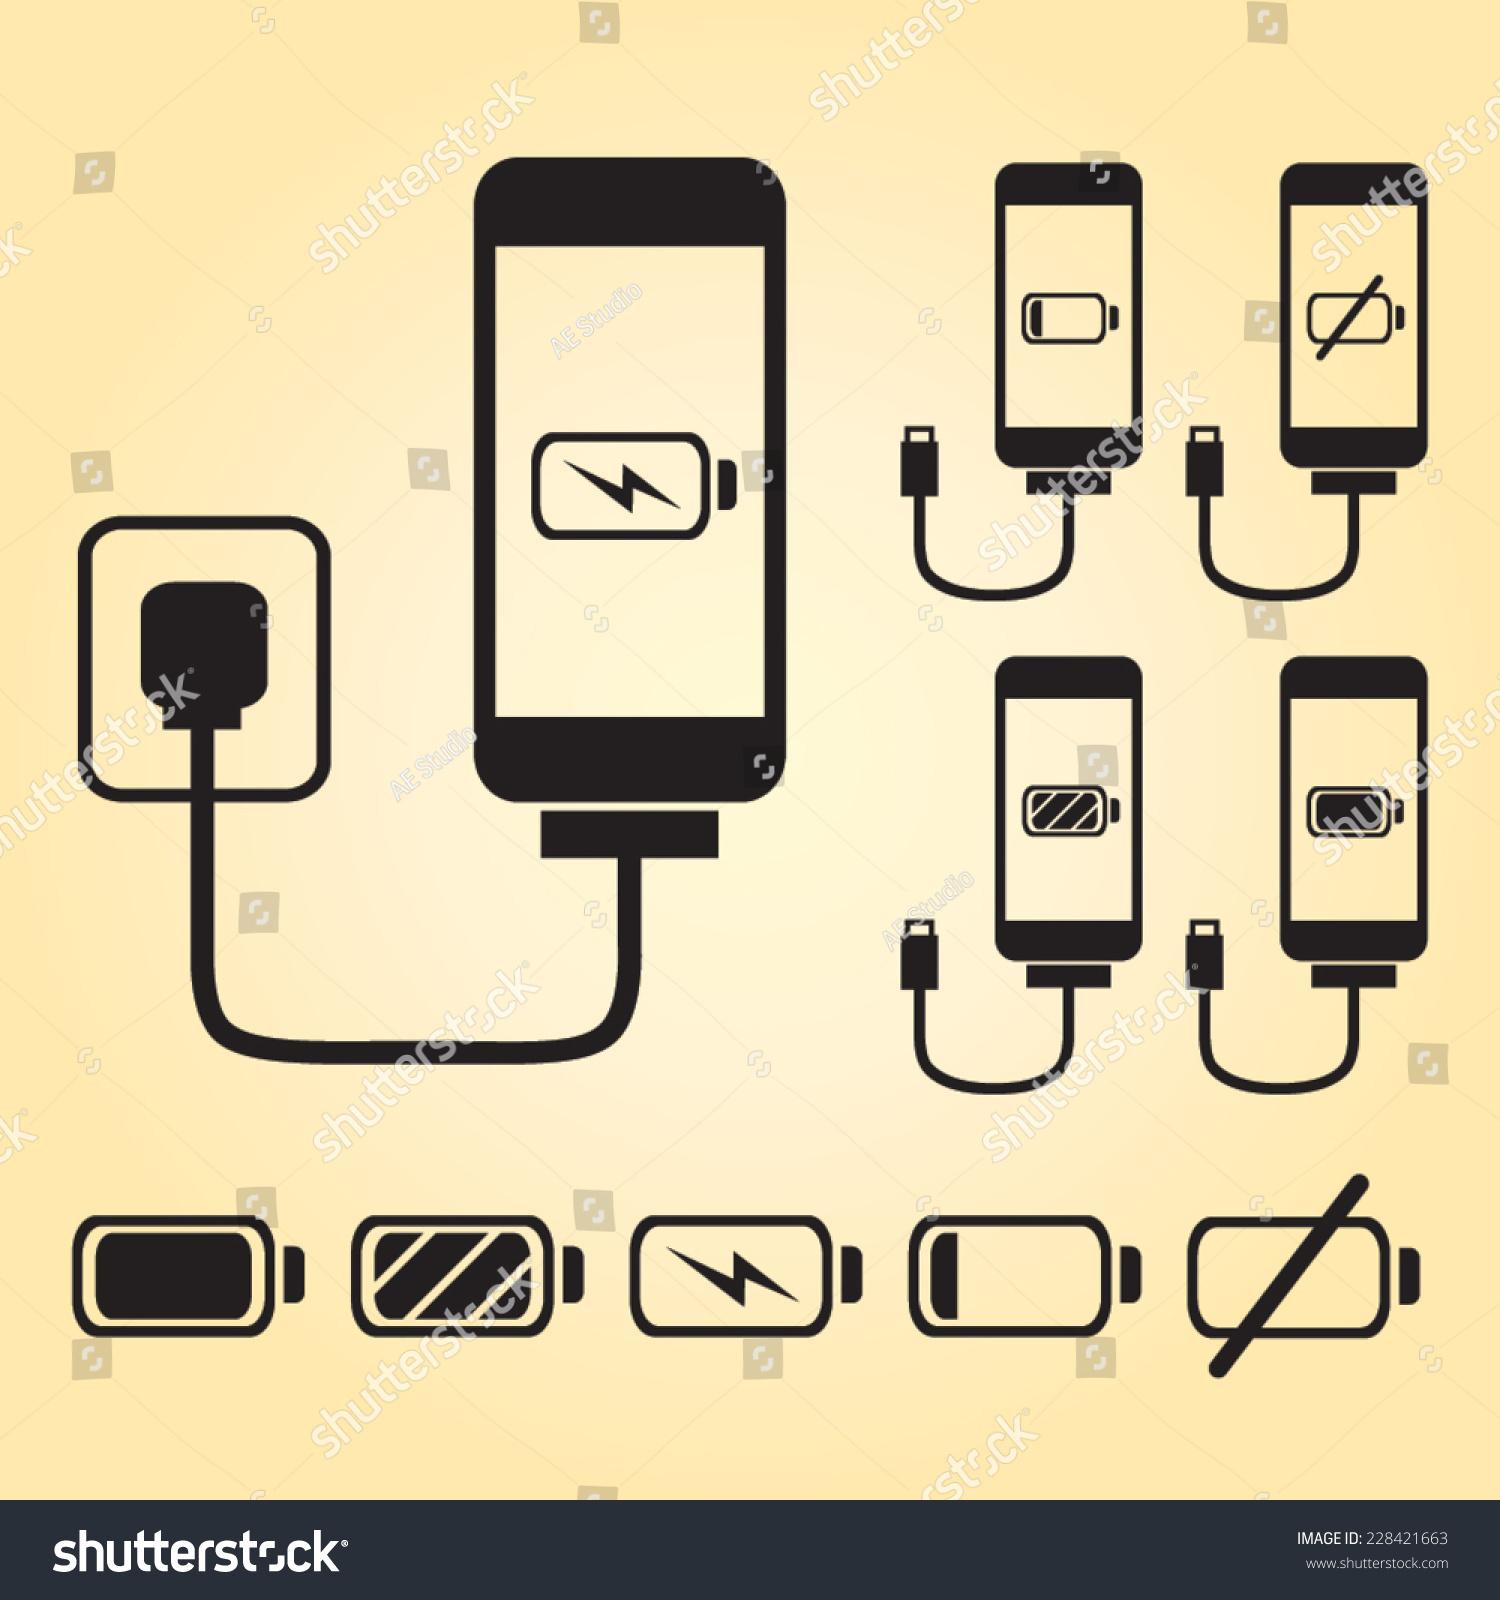 Smart phone iphone charge battery indicator stock vector 228421663 smart phone iphone charge with battery indicator level in black buycottarizona Image collections